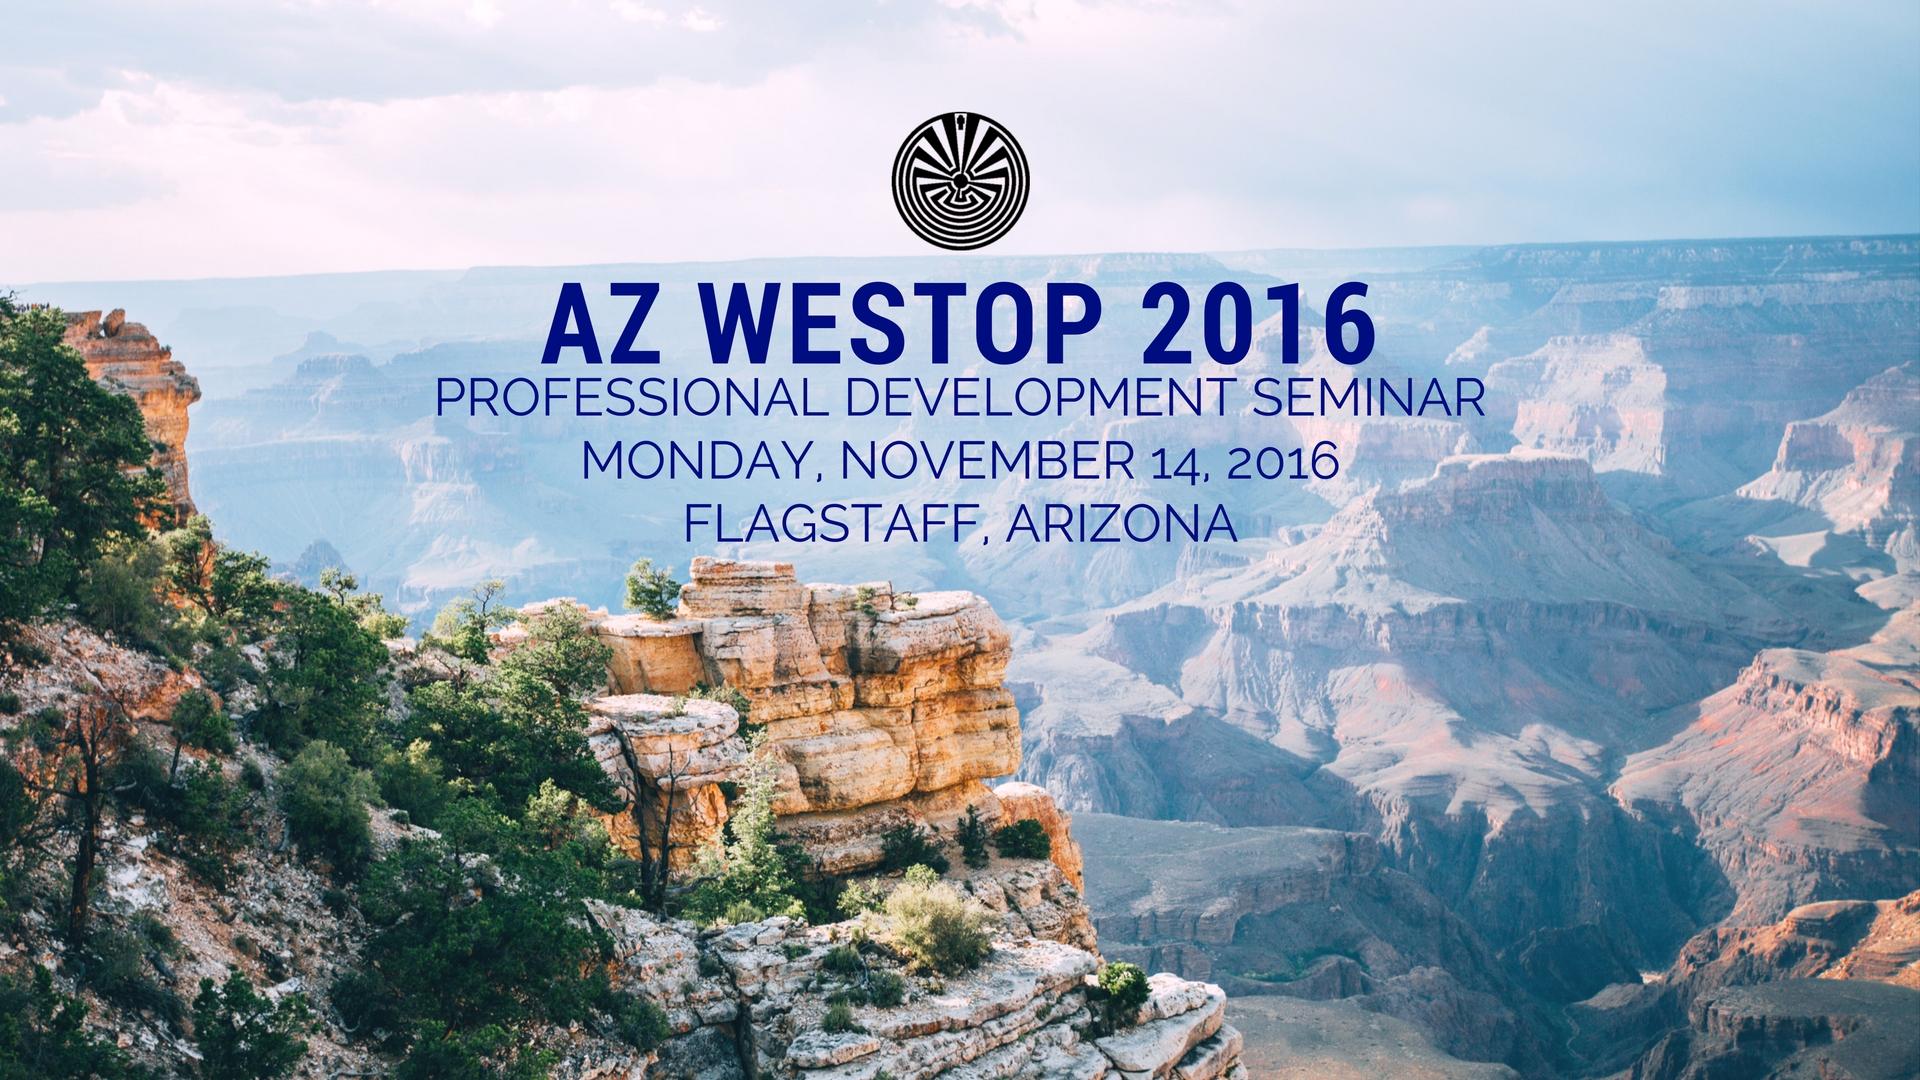 2016 AZ WESTOP Professional Development Seminar